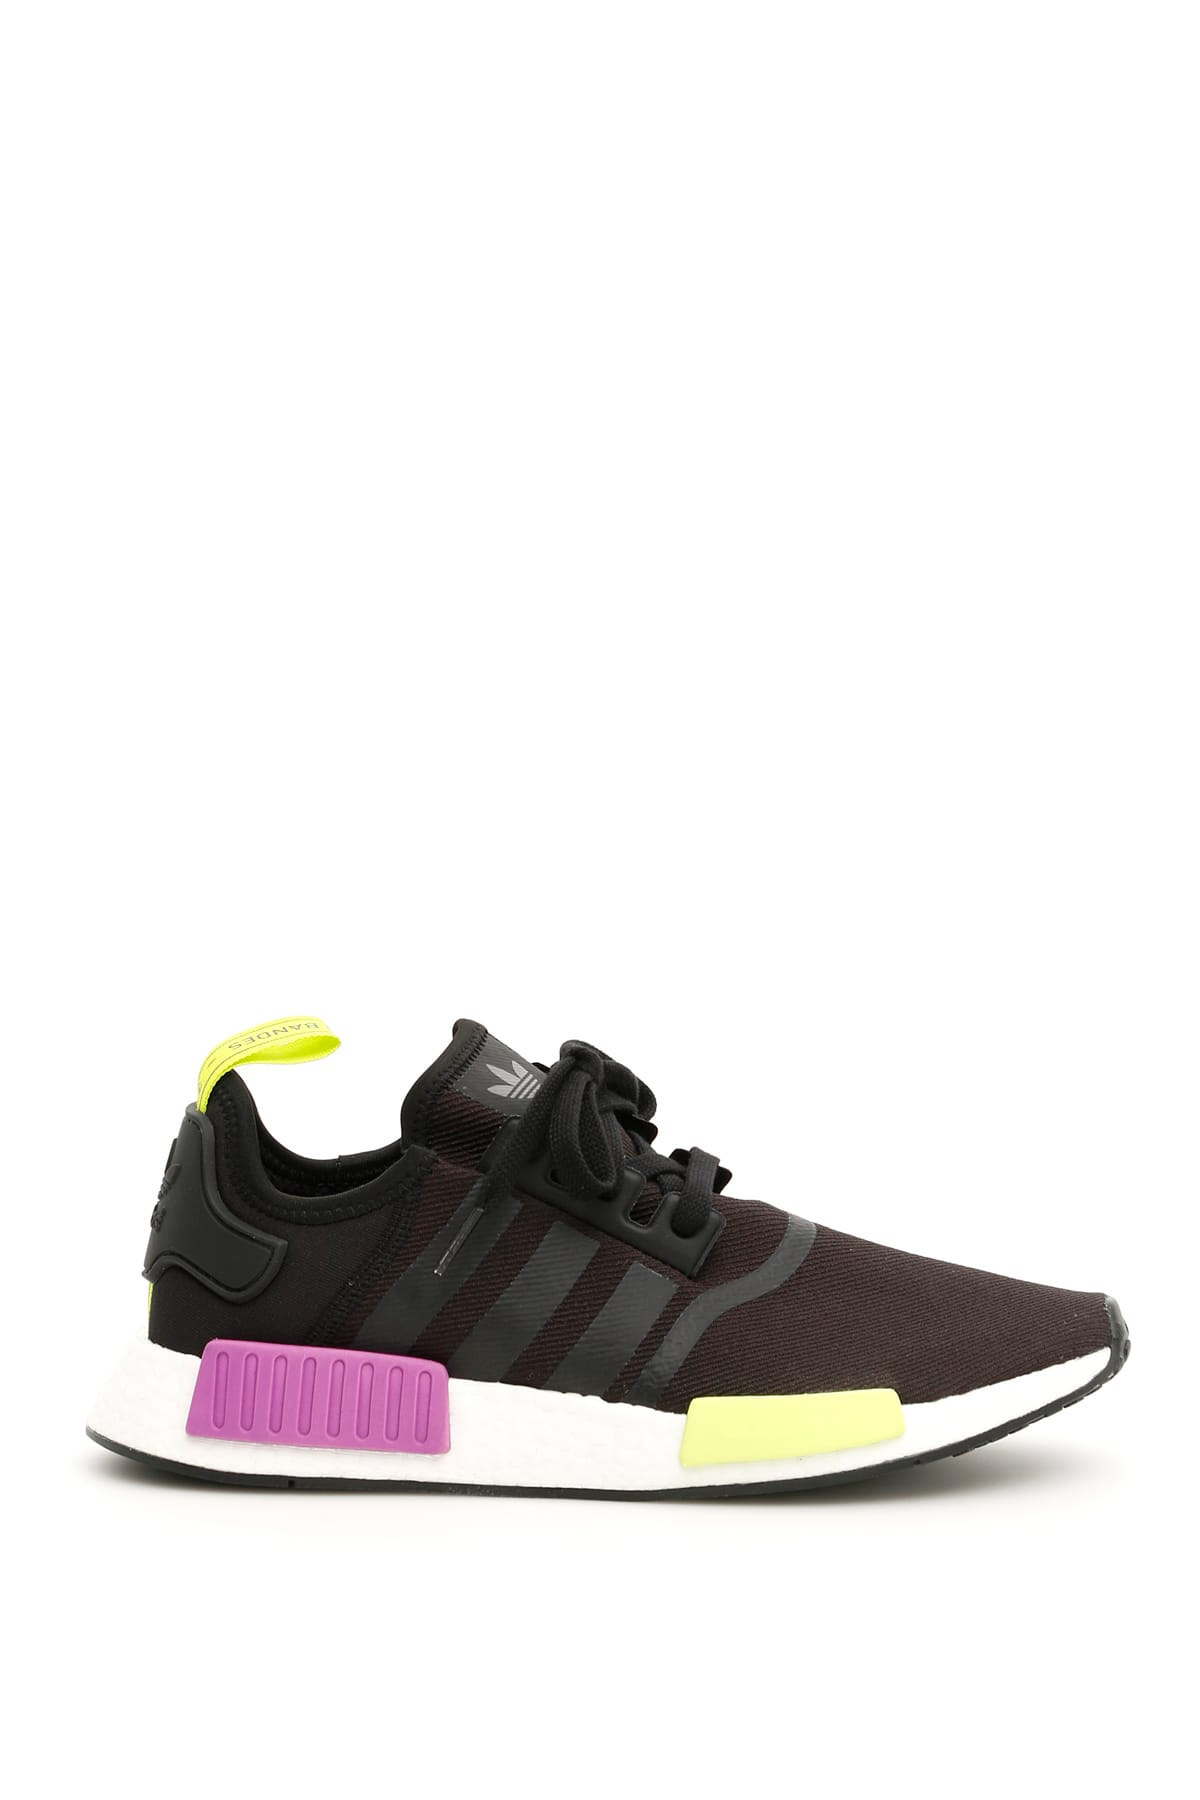 huge discount 83973 03aec Adidas Nmd R1 Sneakers